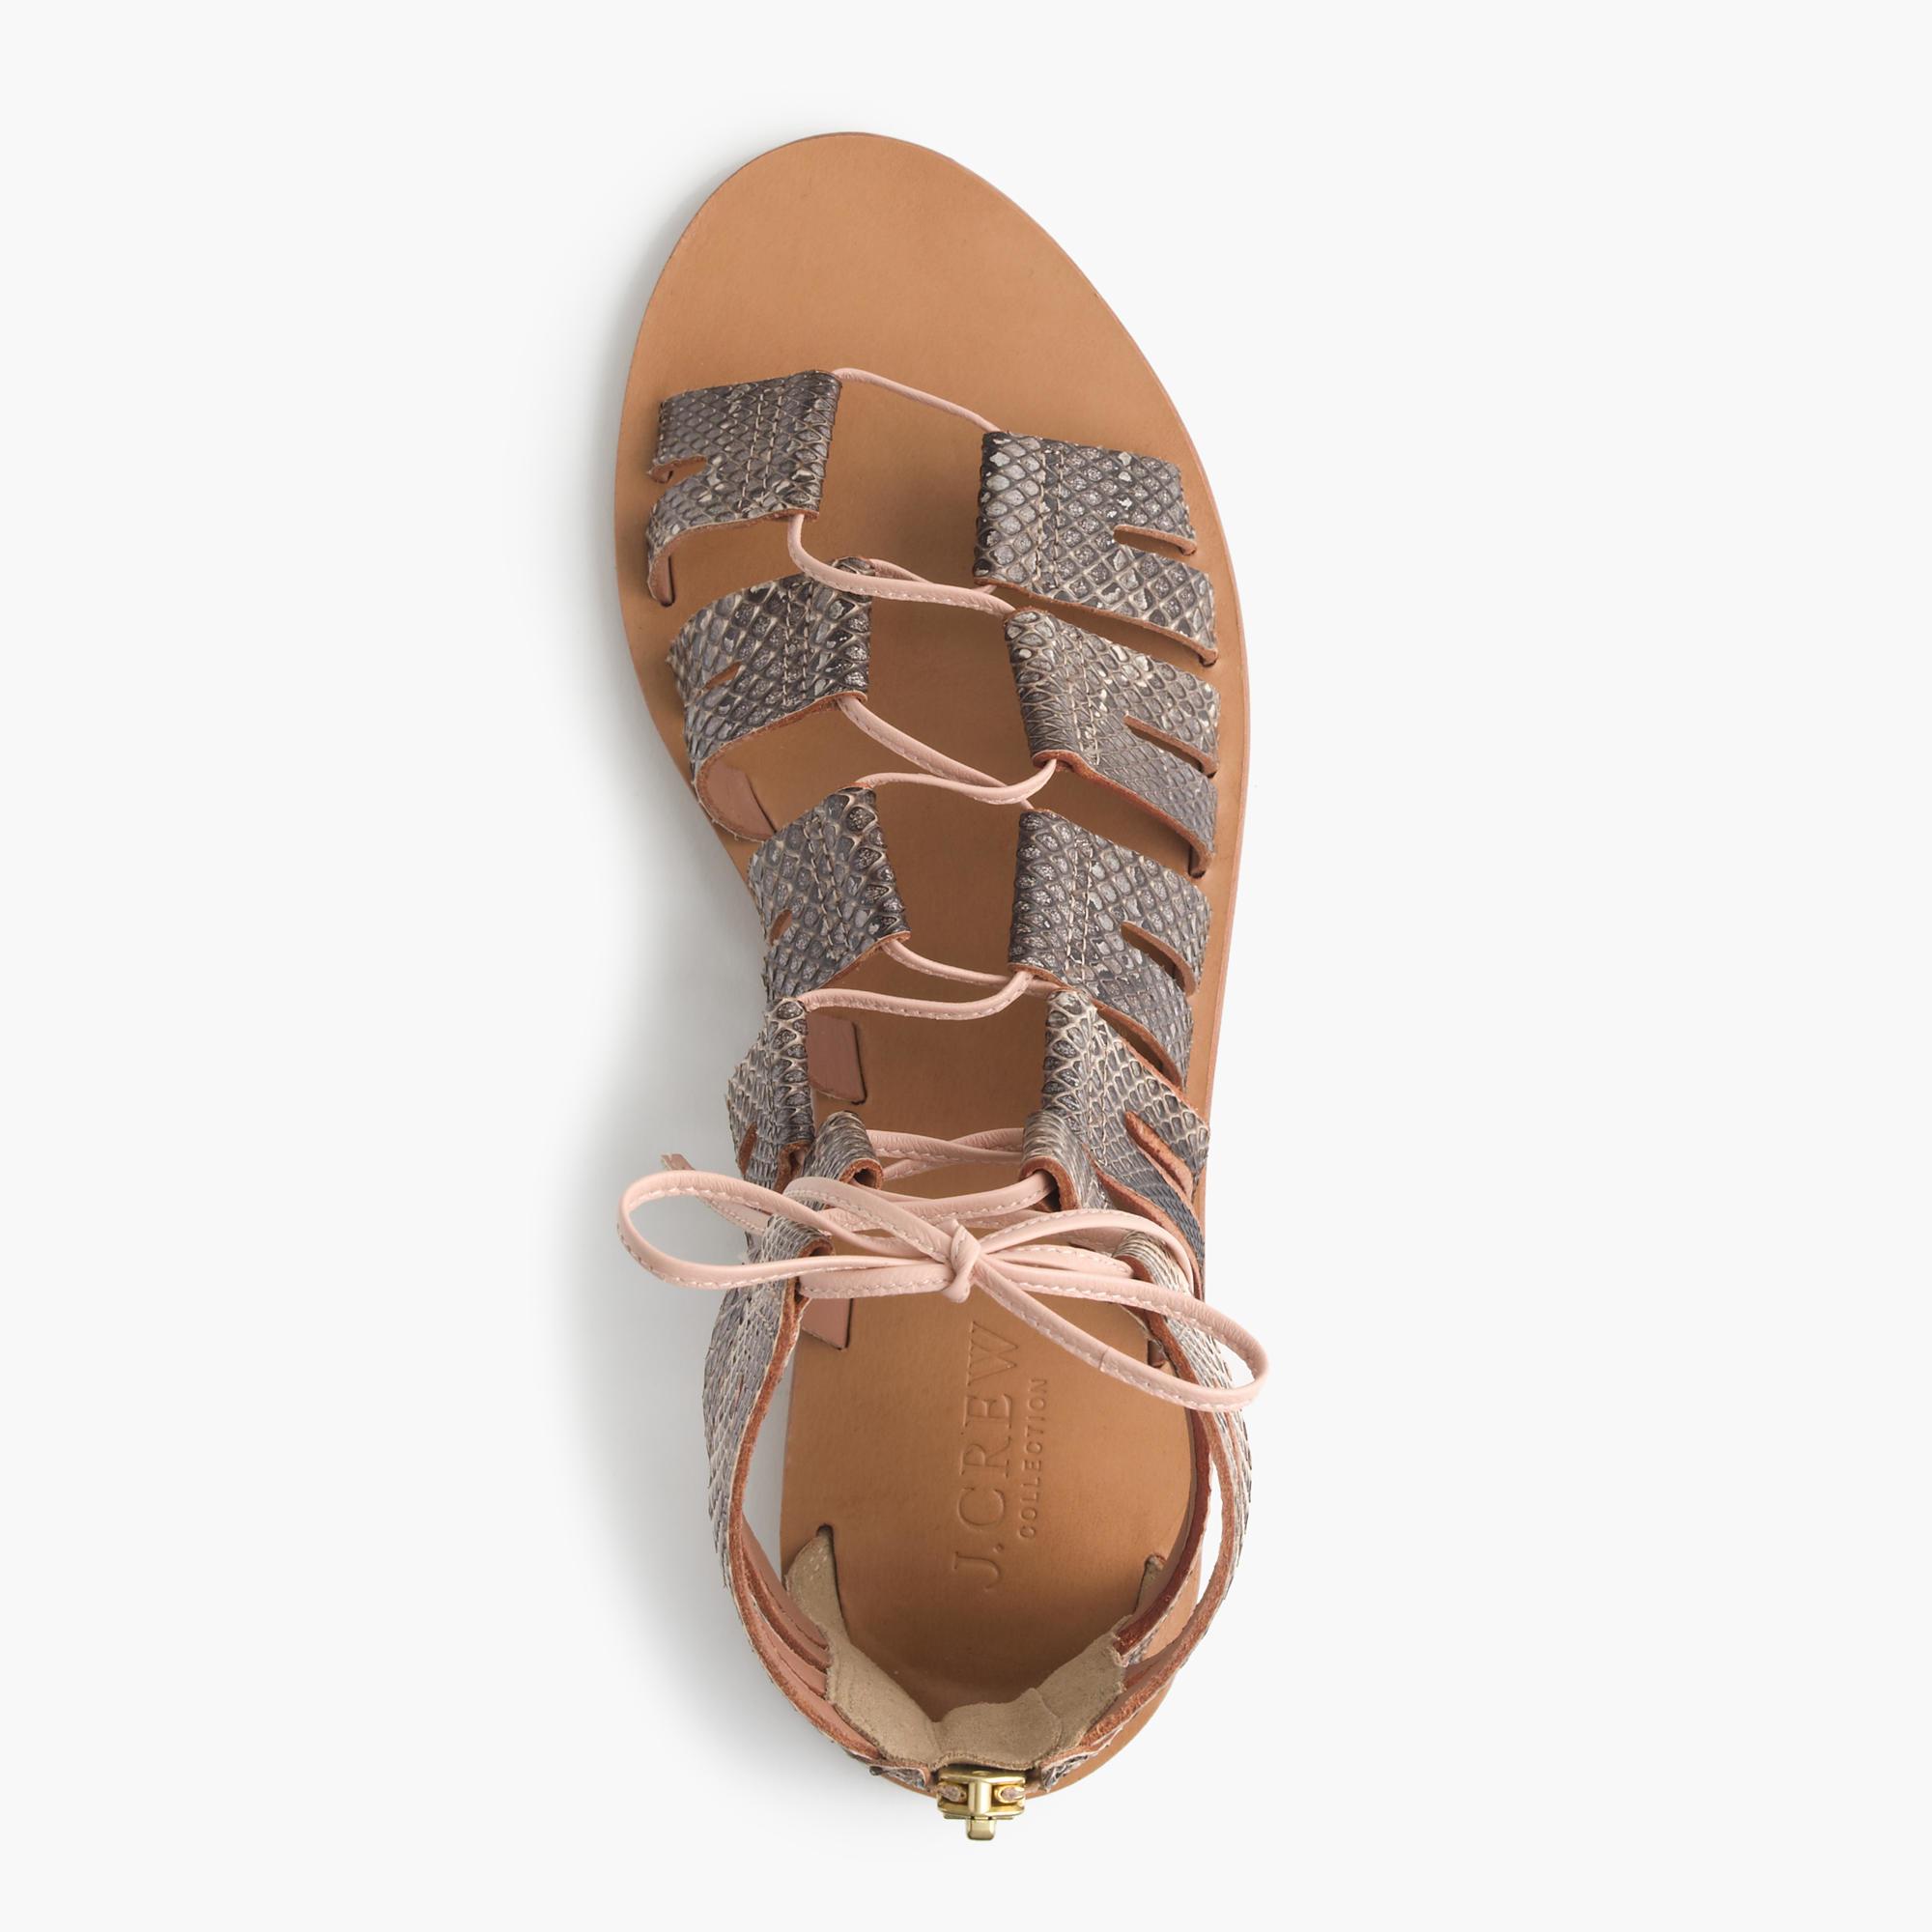 8ebbc224c542 J.Crew Aztec Snakeskin Lace-up Gladiator Sandals - Lyst